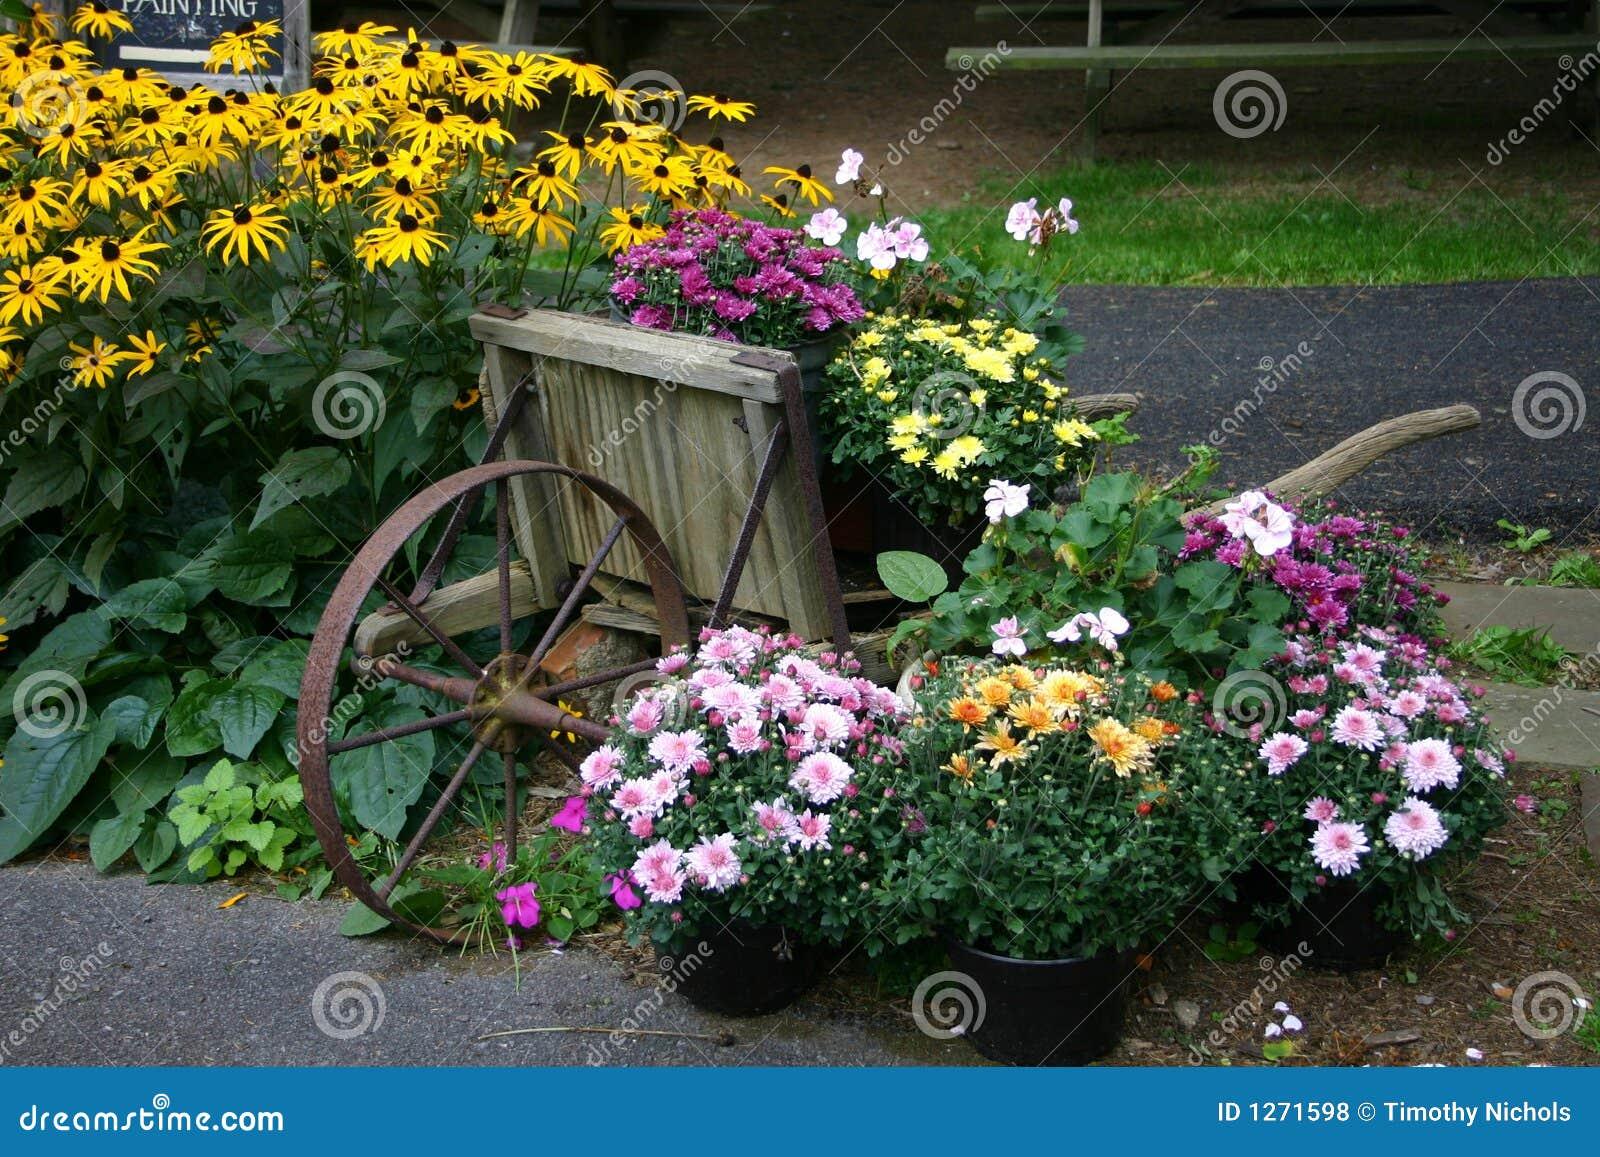 la primavera idee giardino fresco : Affichage De Jardin De Fleur Avec La Brouette Photos libres de droits ...